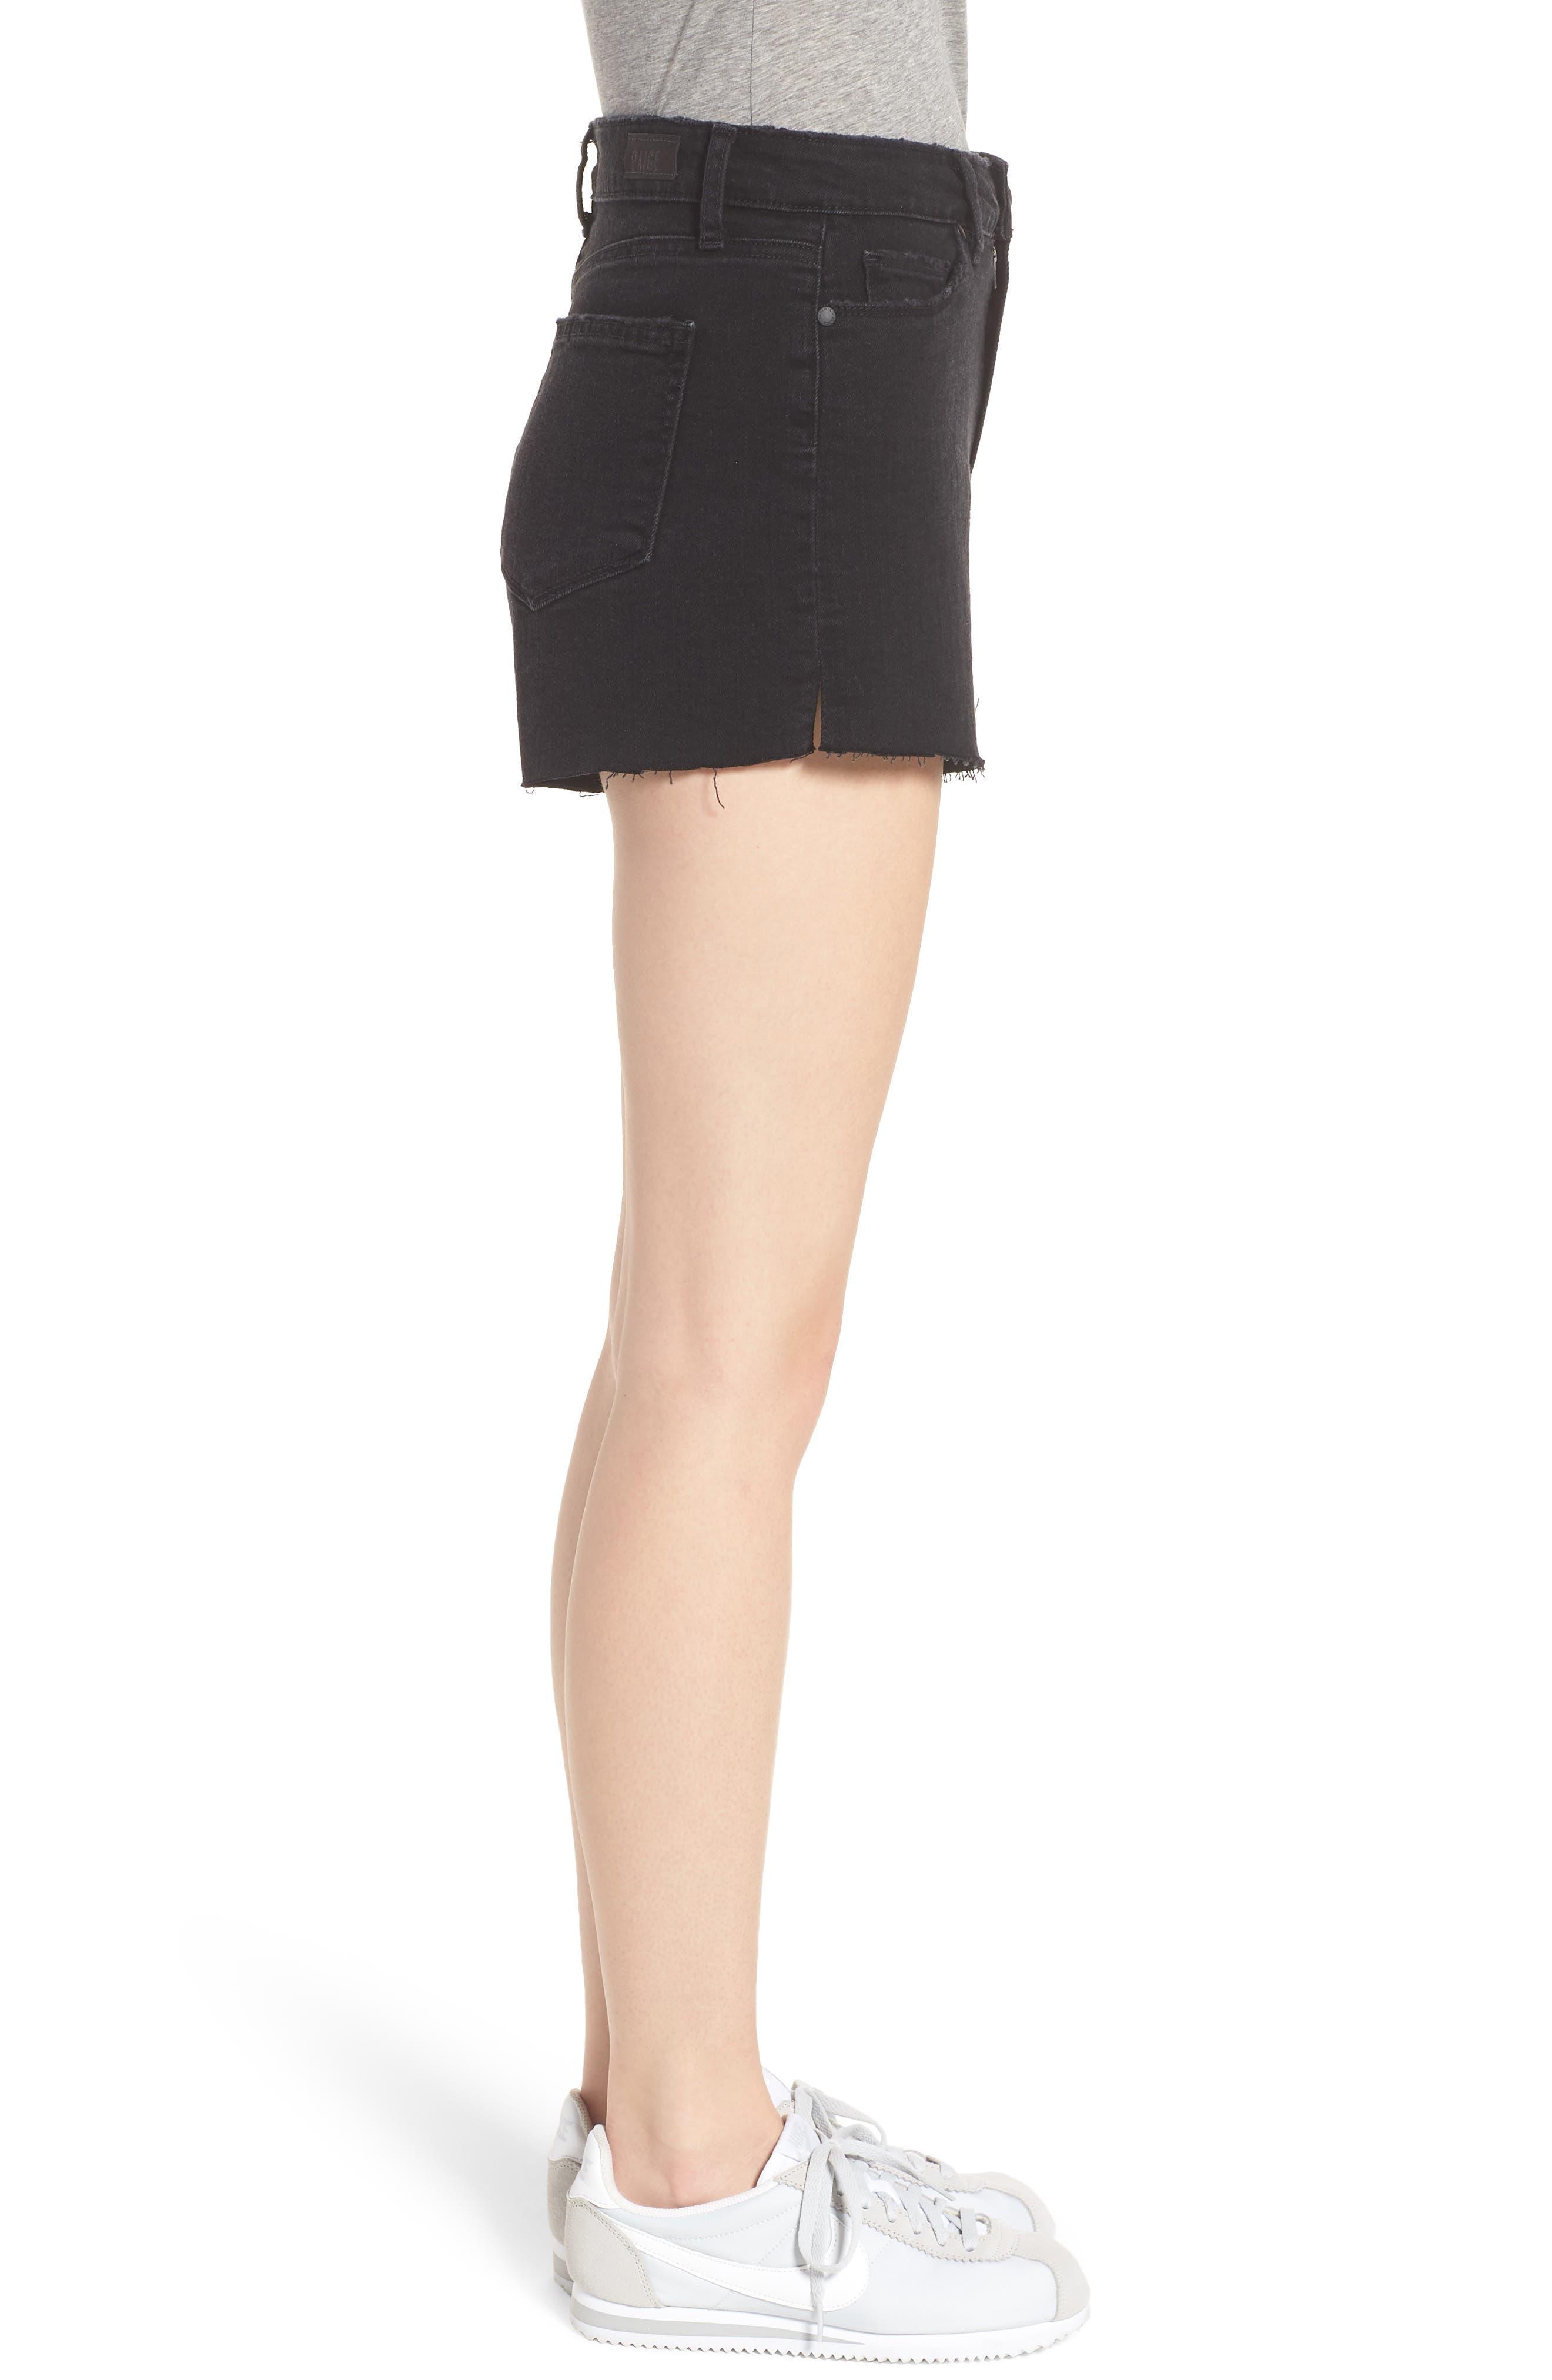 'Margot' High Rise Cutoff Denim Shorts,                             Alternate thumbnail 3, color,                             001